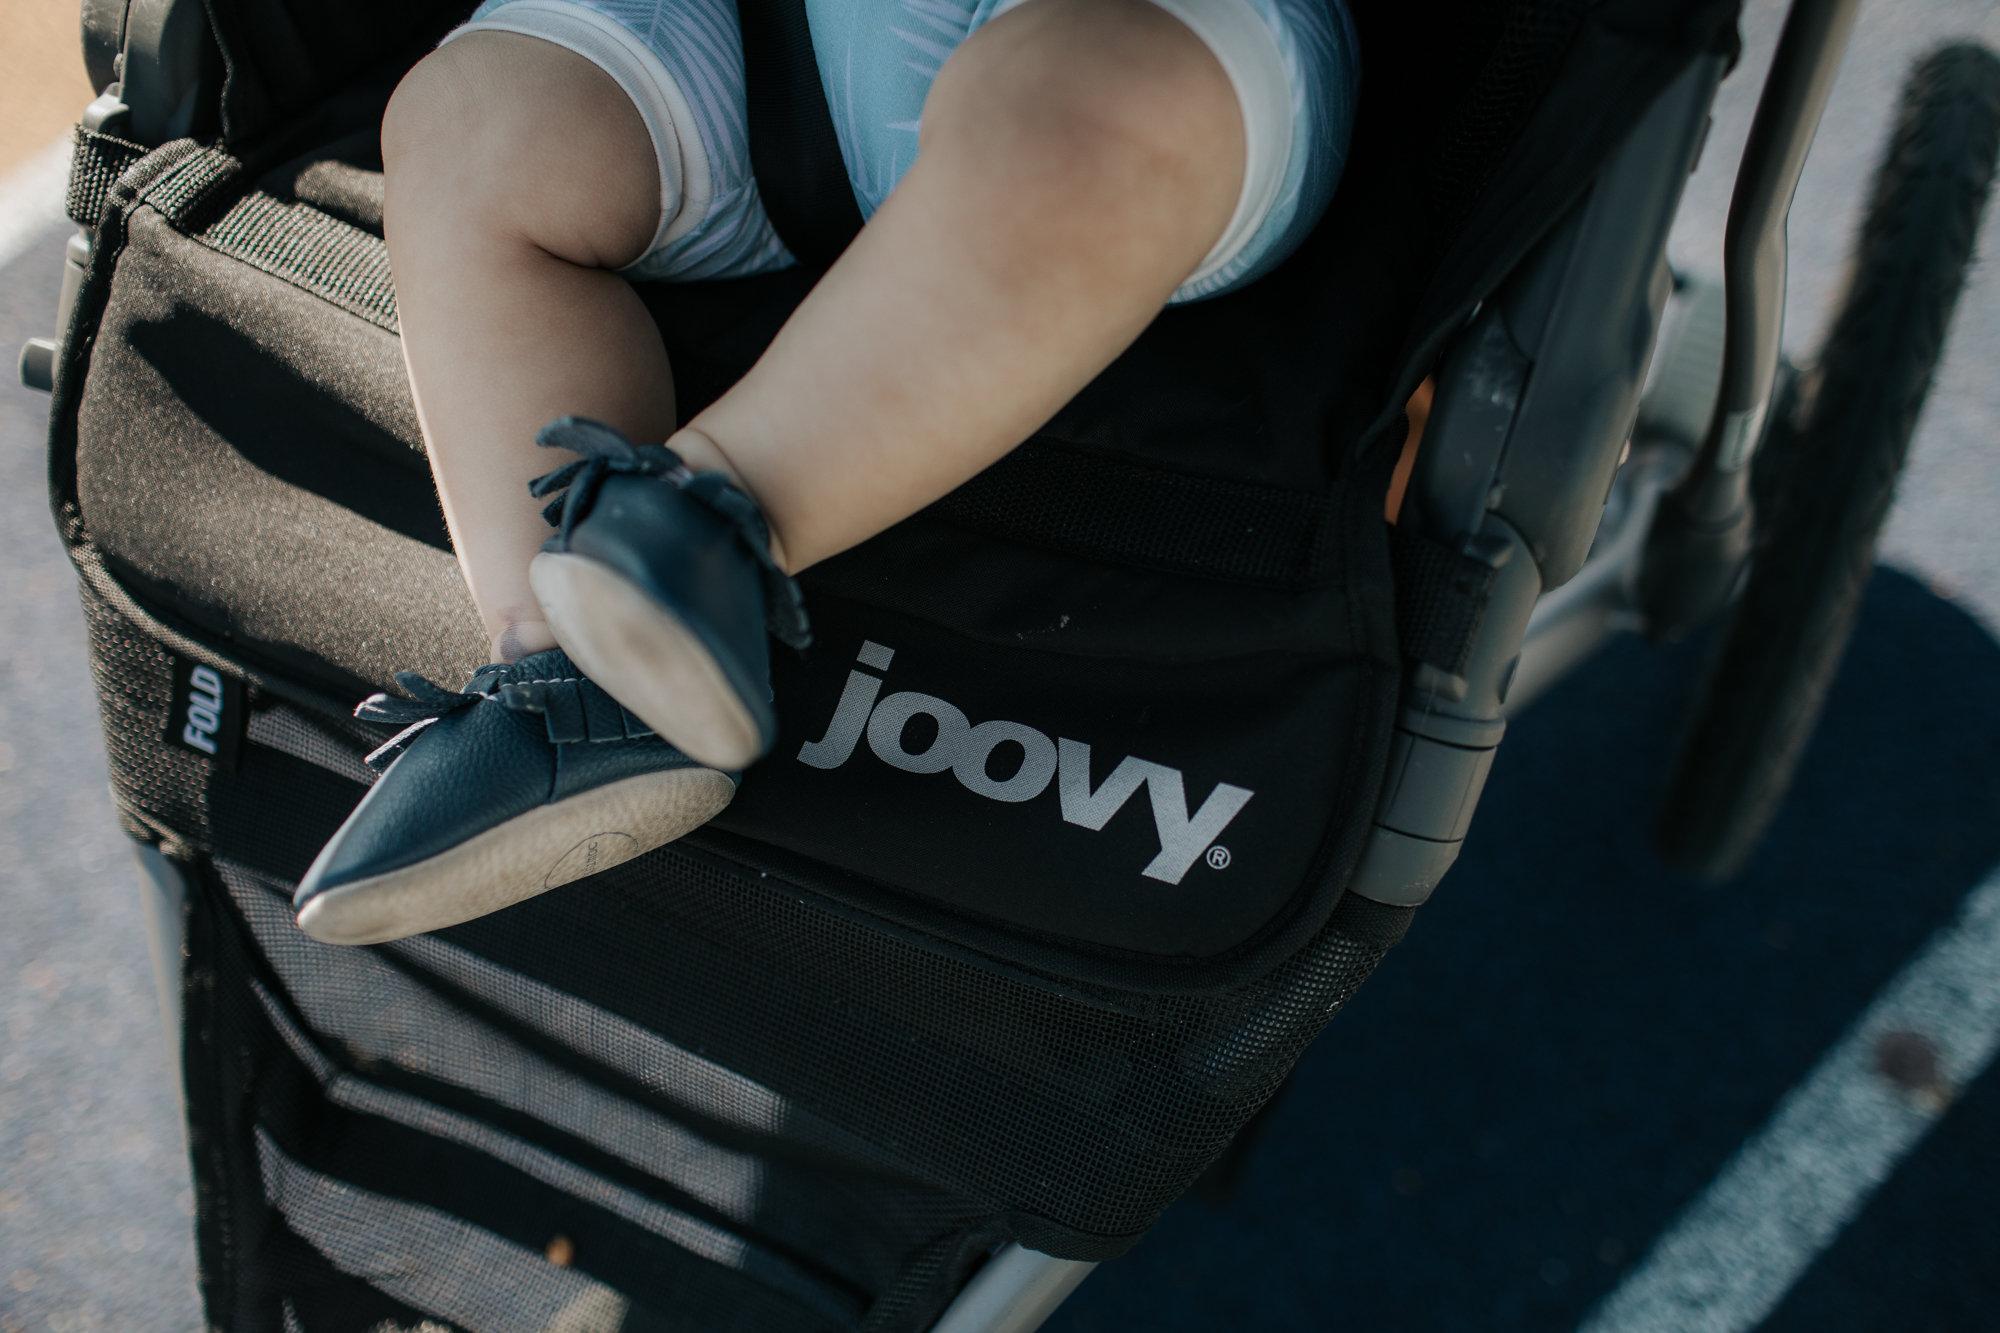 Joovy Zoom 360, Joovy Zoom ultralight, Joovy Zoom, Joovy Strollers